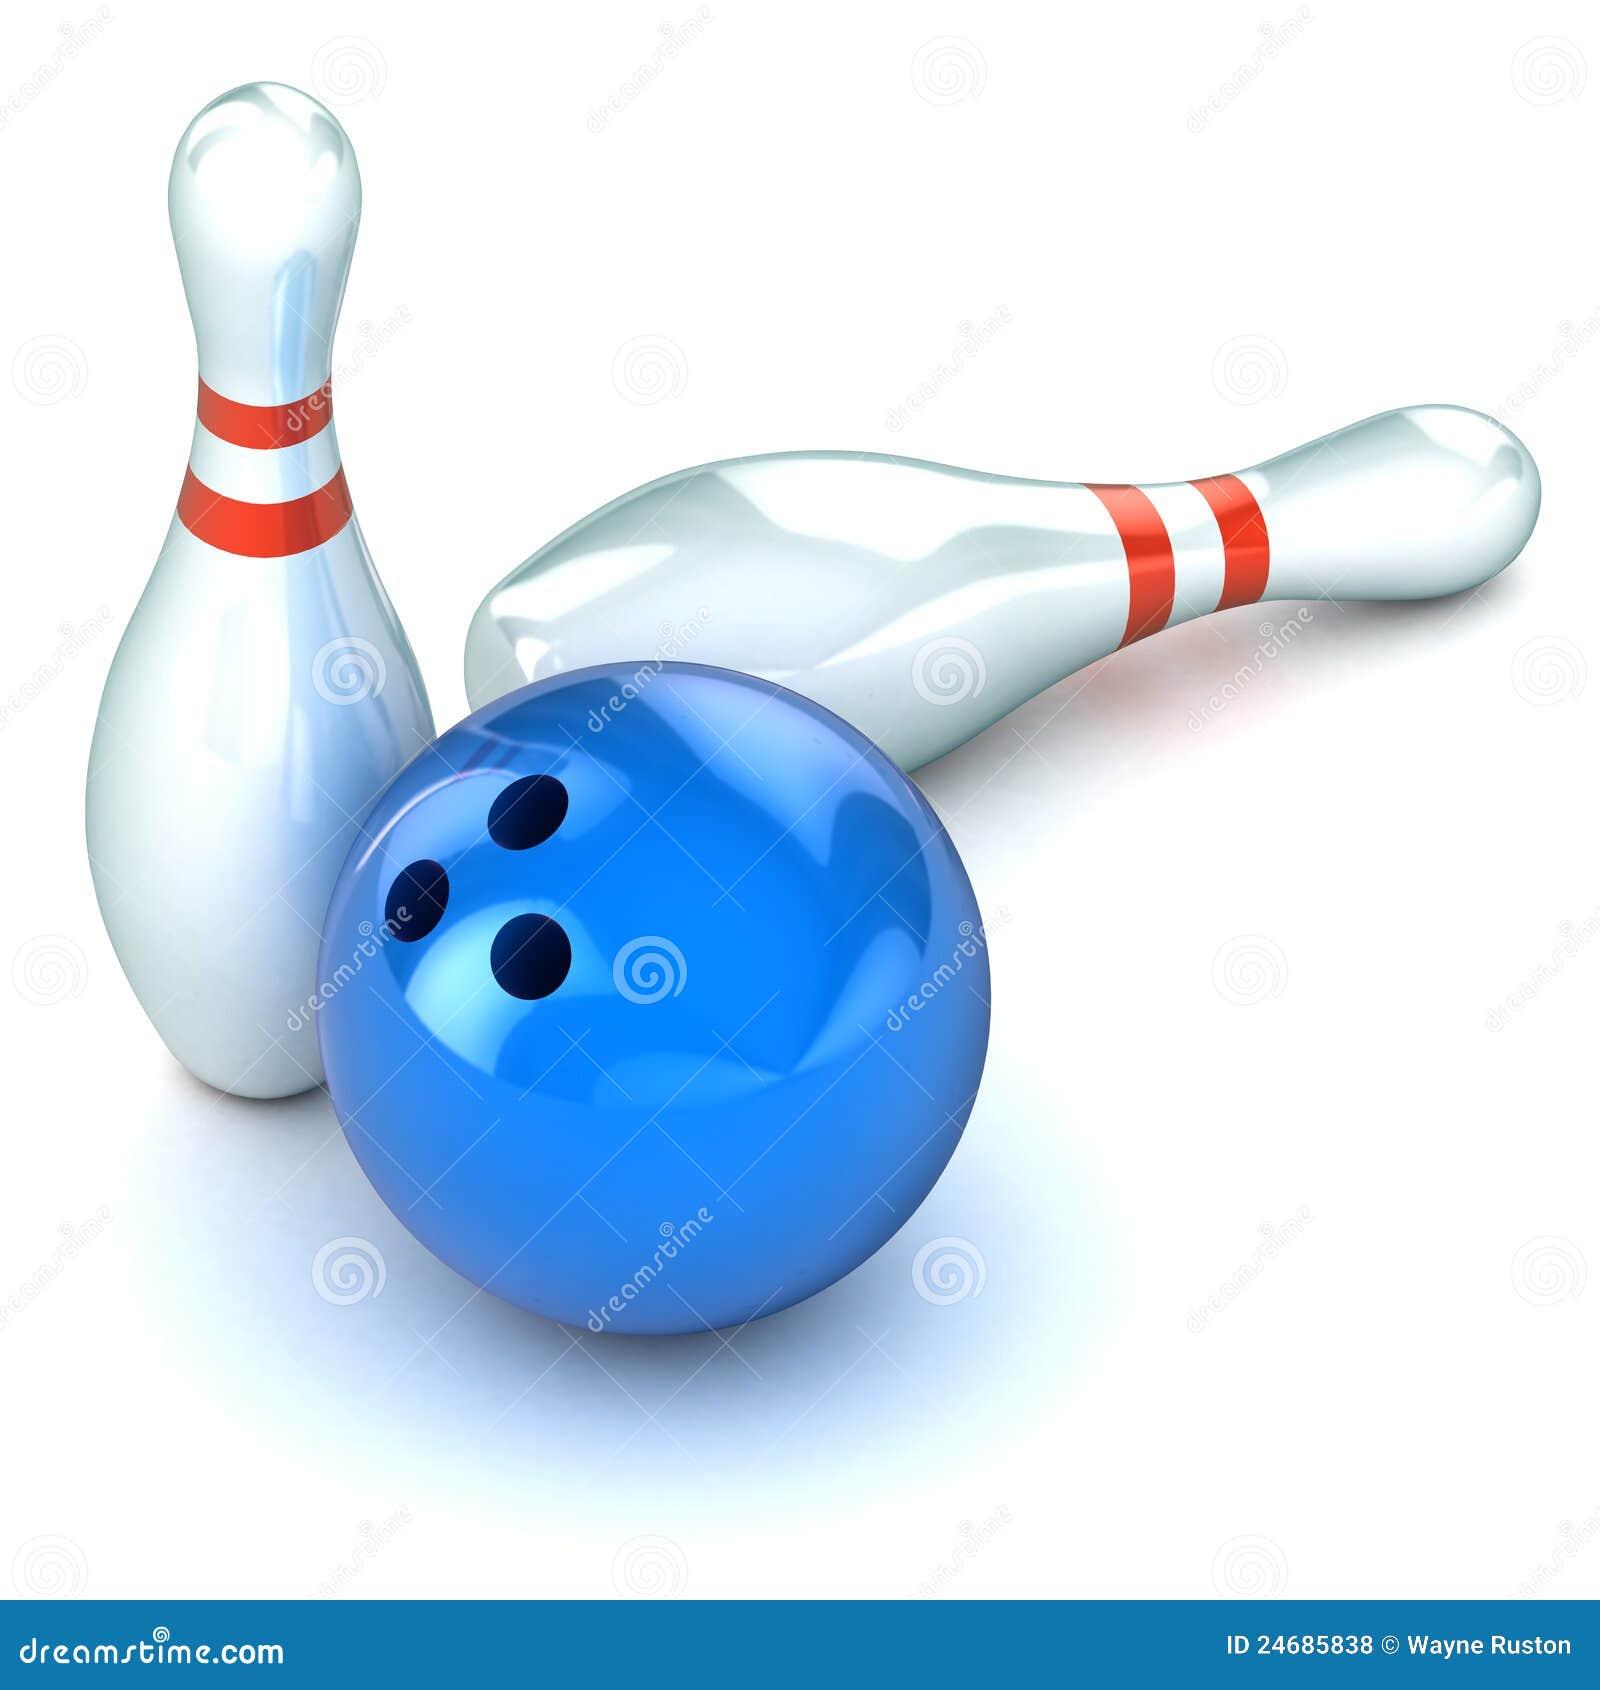 Ten Pin Bowling Illustration Royalty Free Stock Photos ...